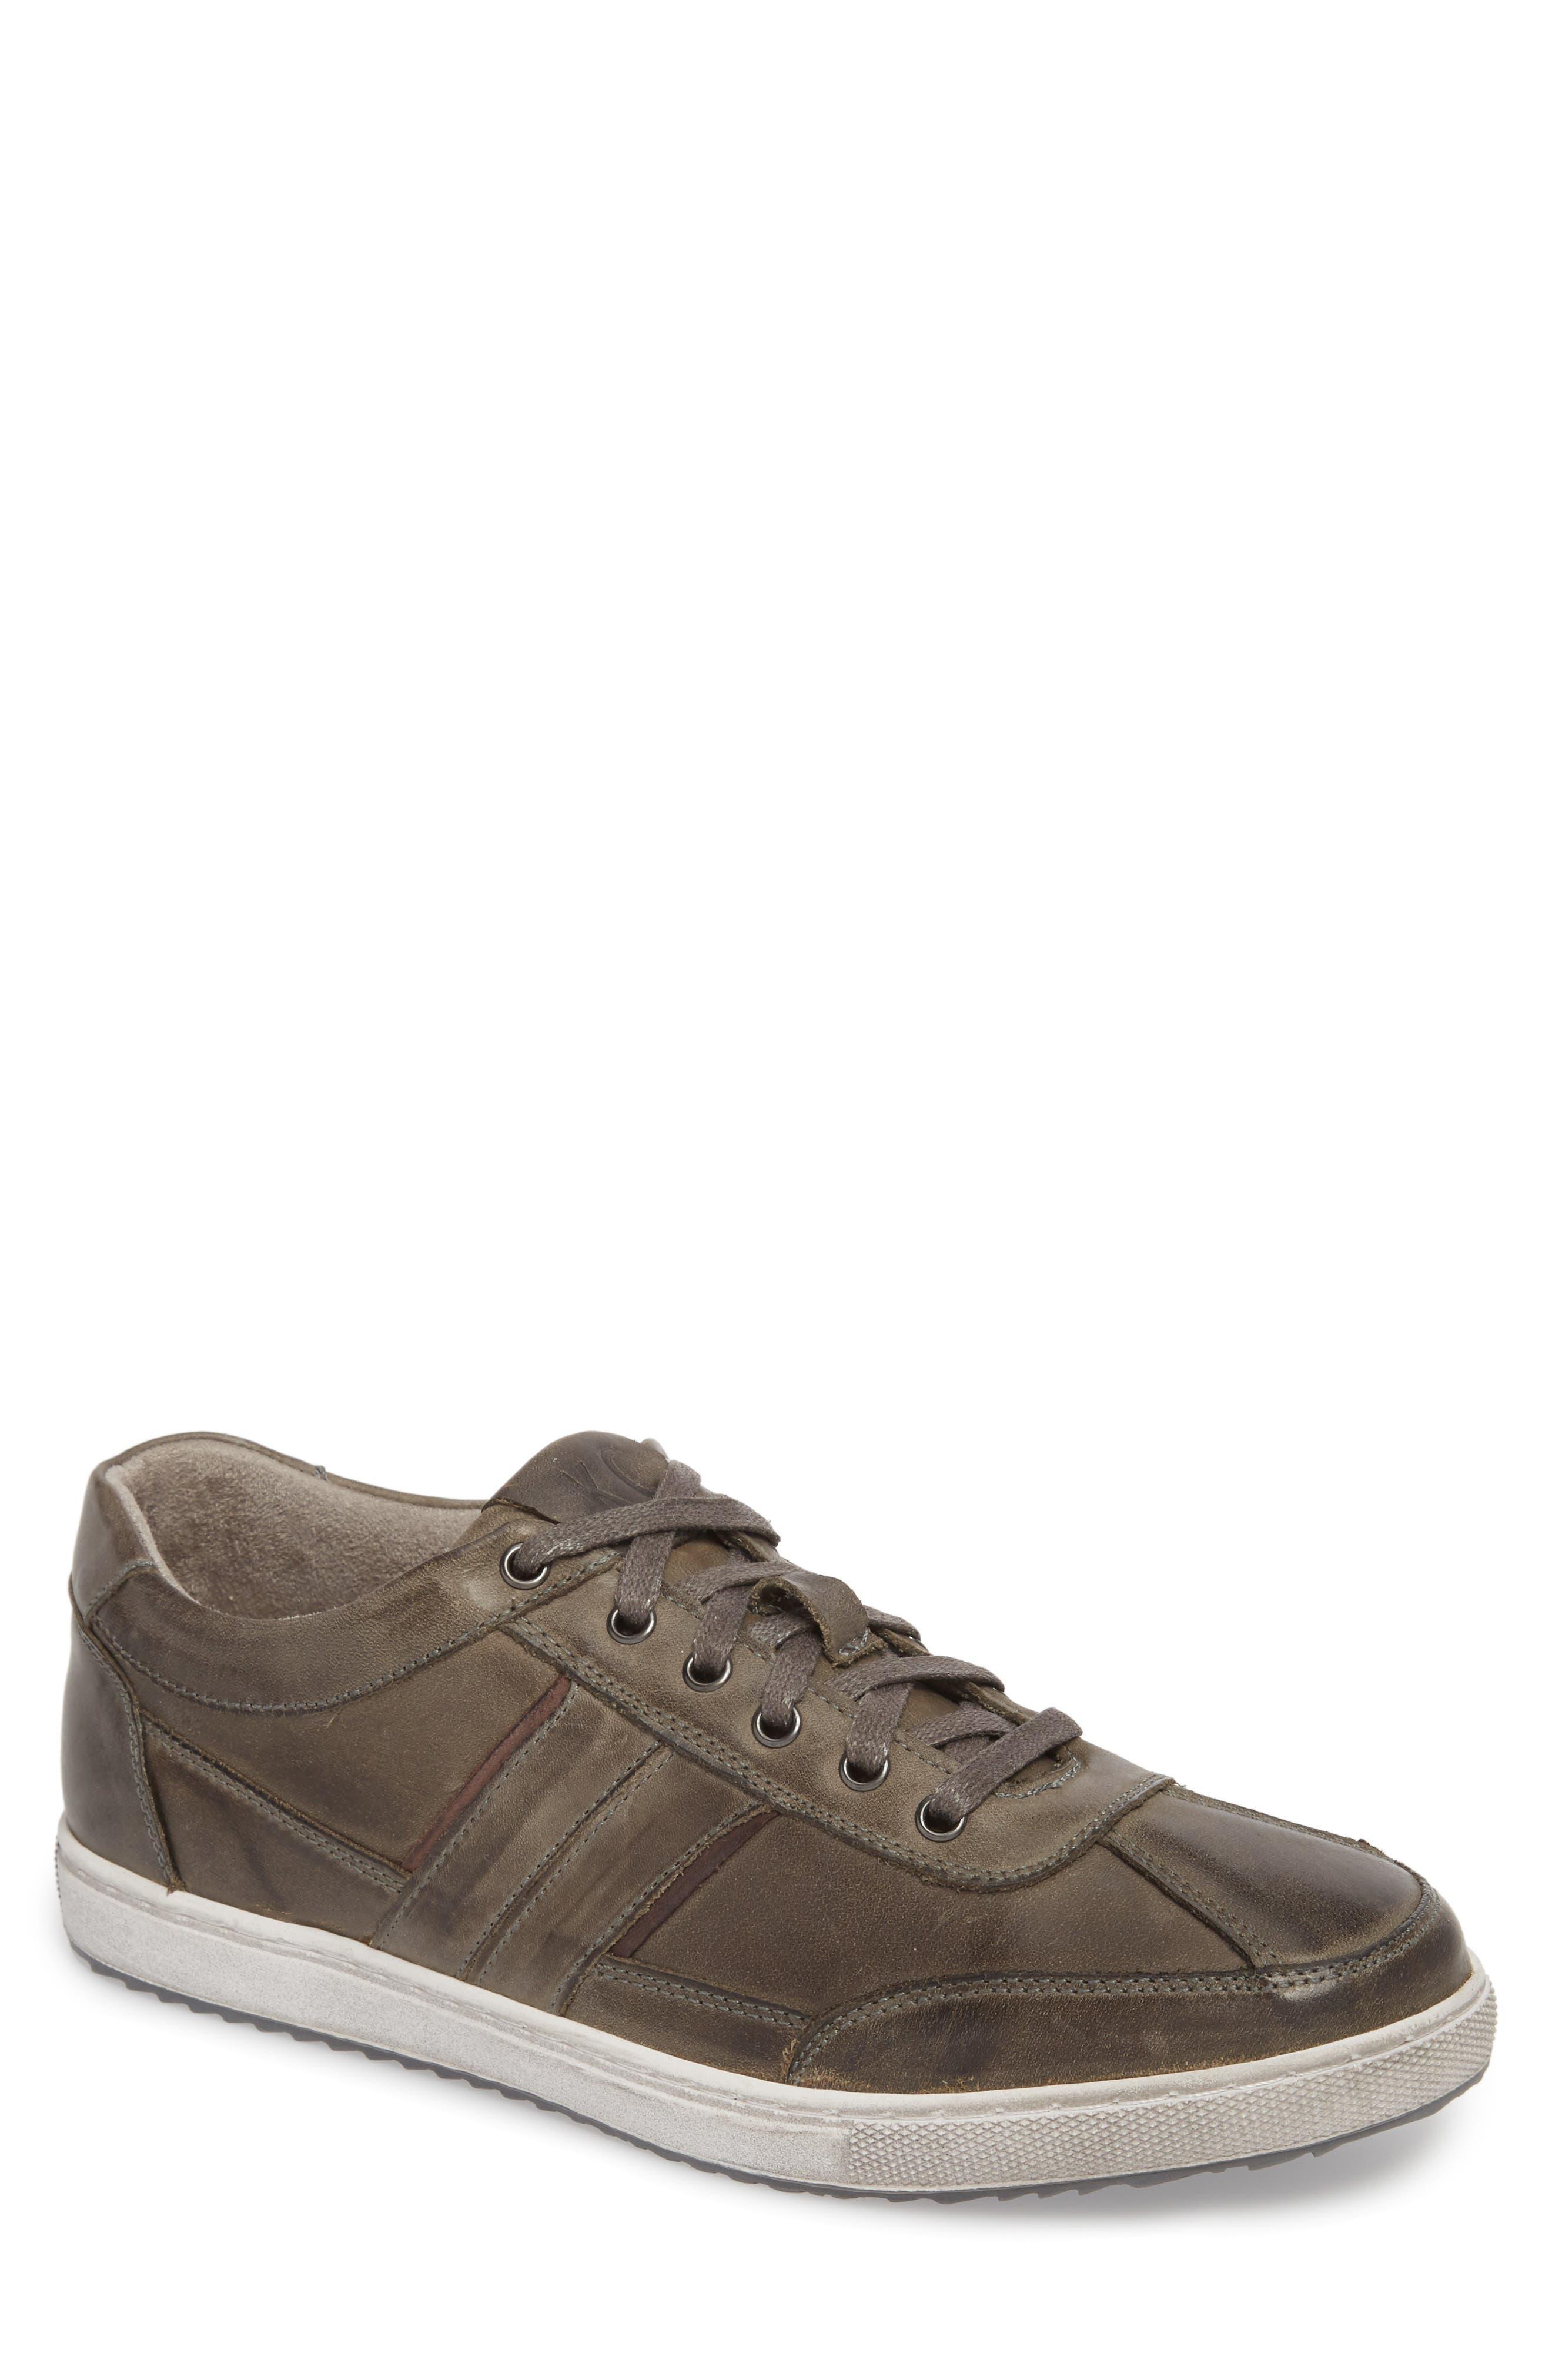 Sprinter Low Top Sneaker,                         Main,                         color, Grey